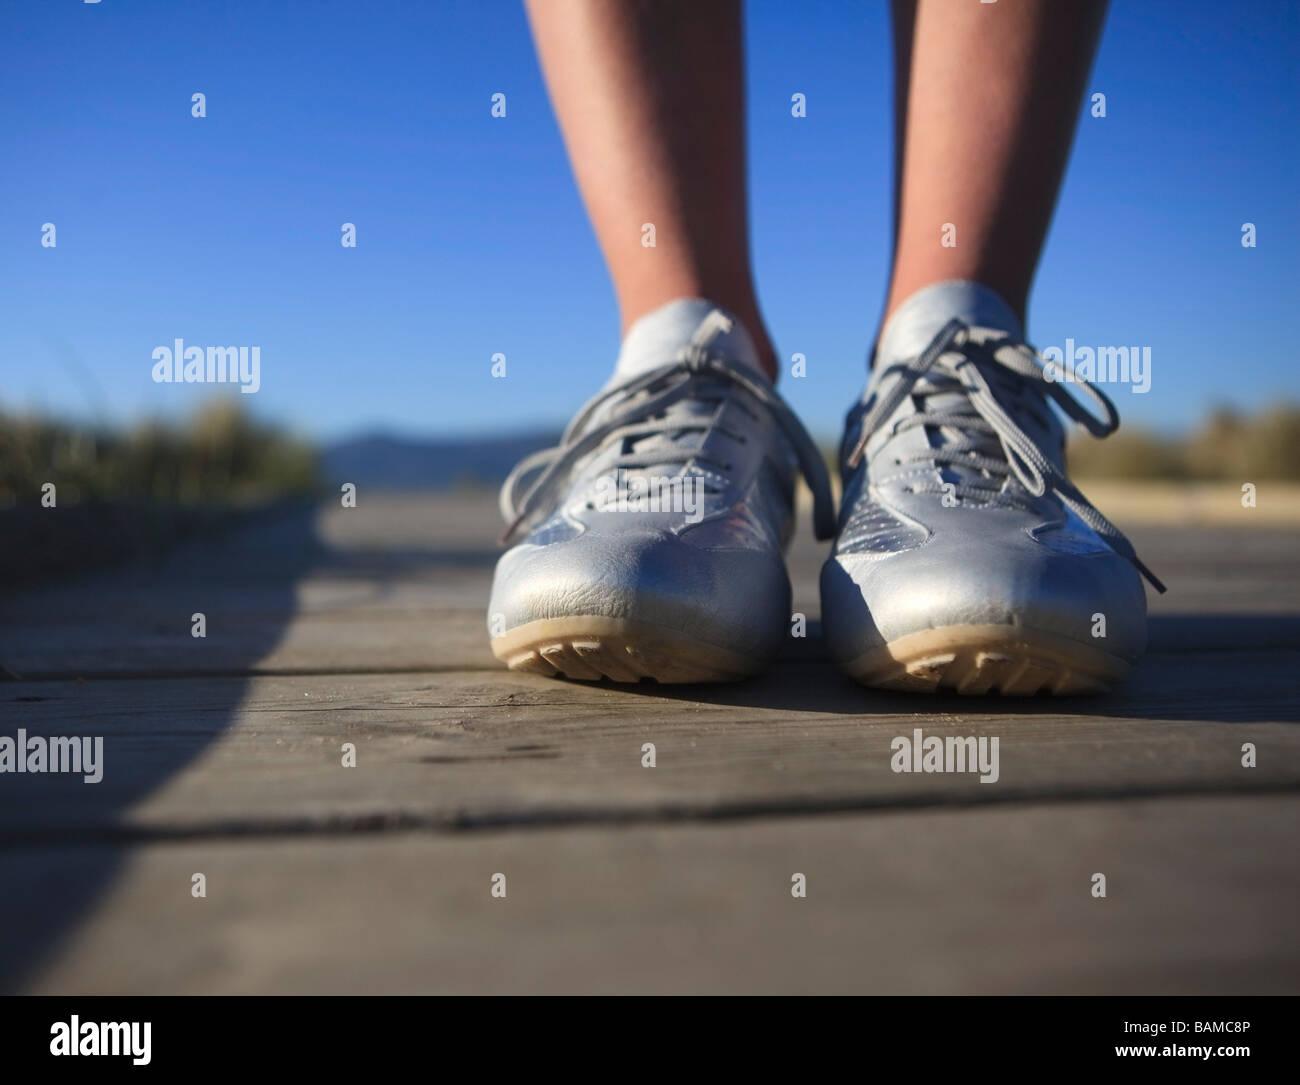 Füße auf dem Boden Stockbild